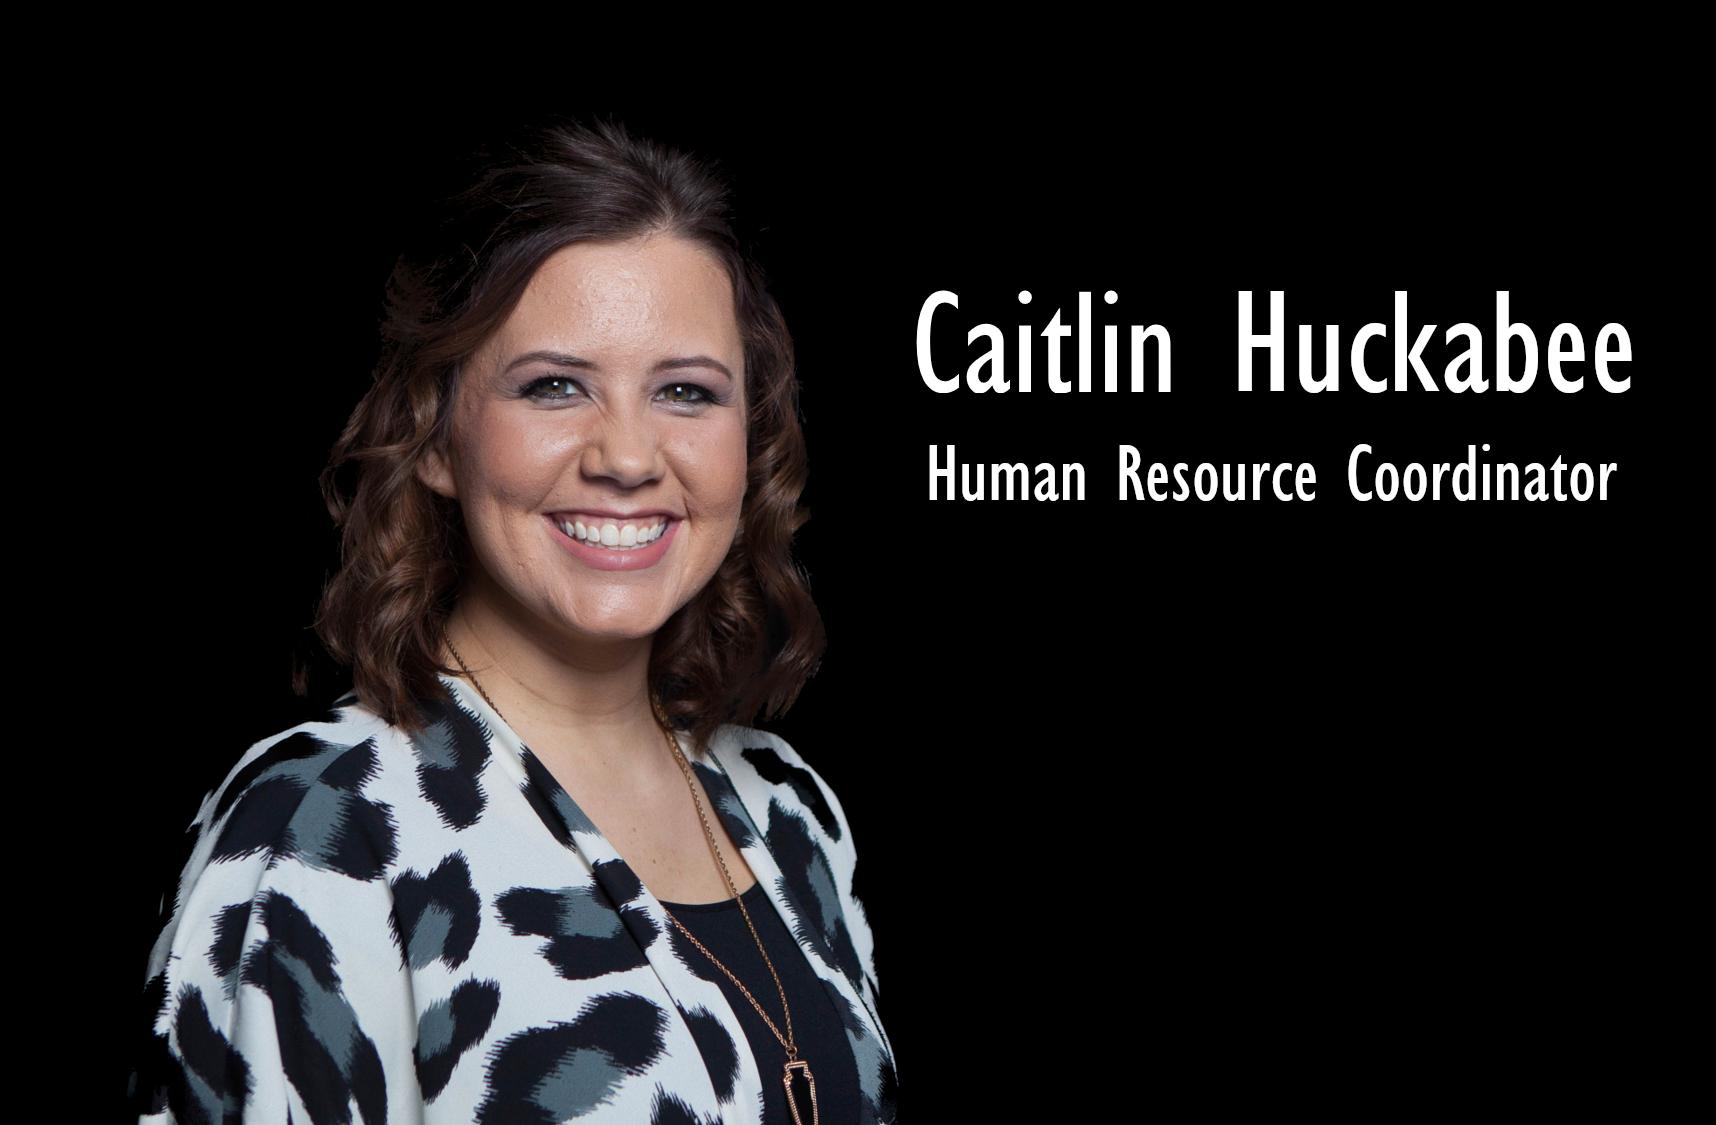 Caitlin Huckabee